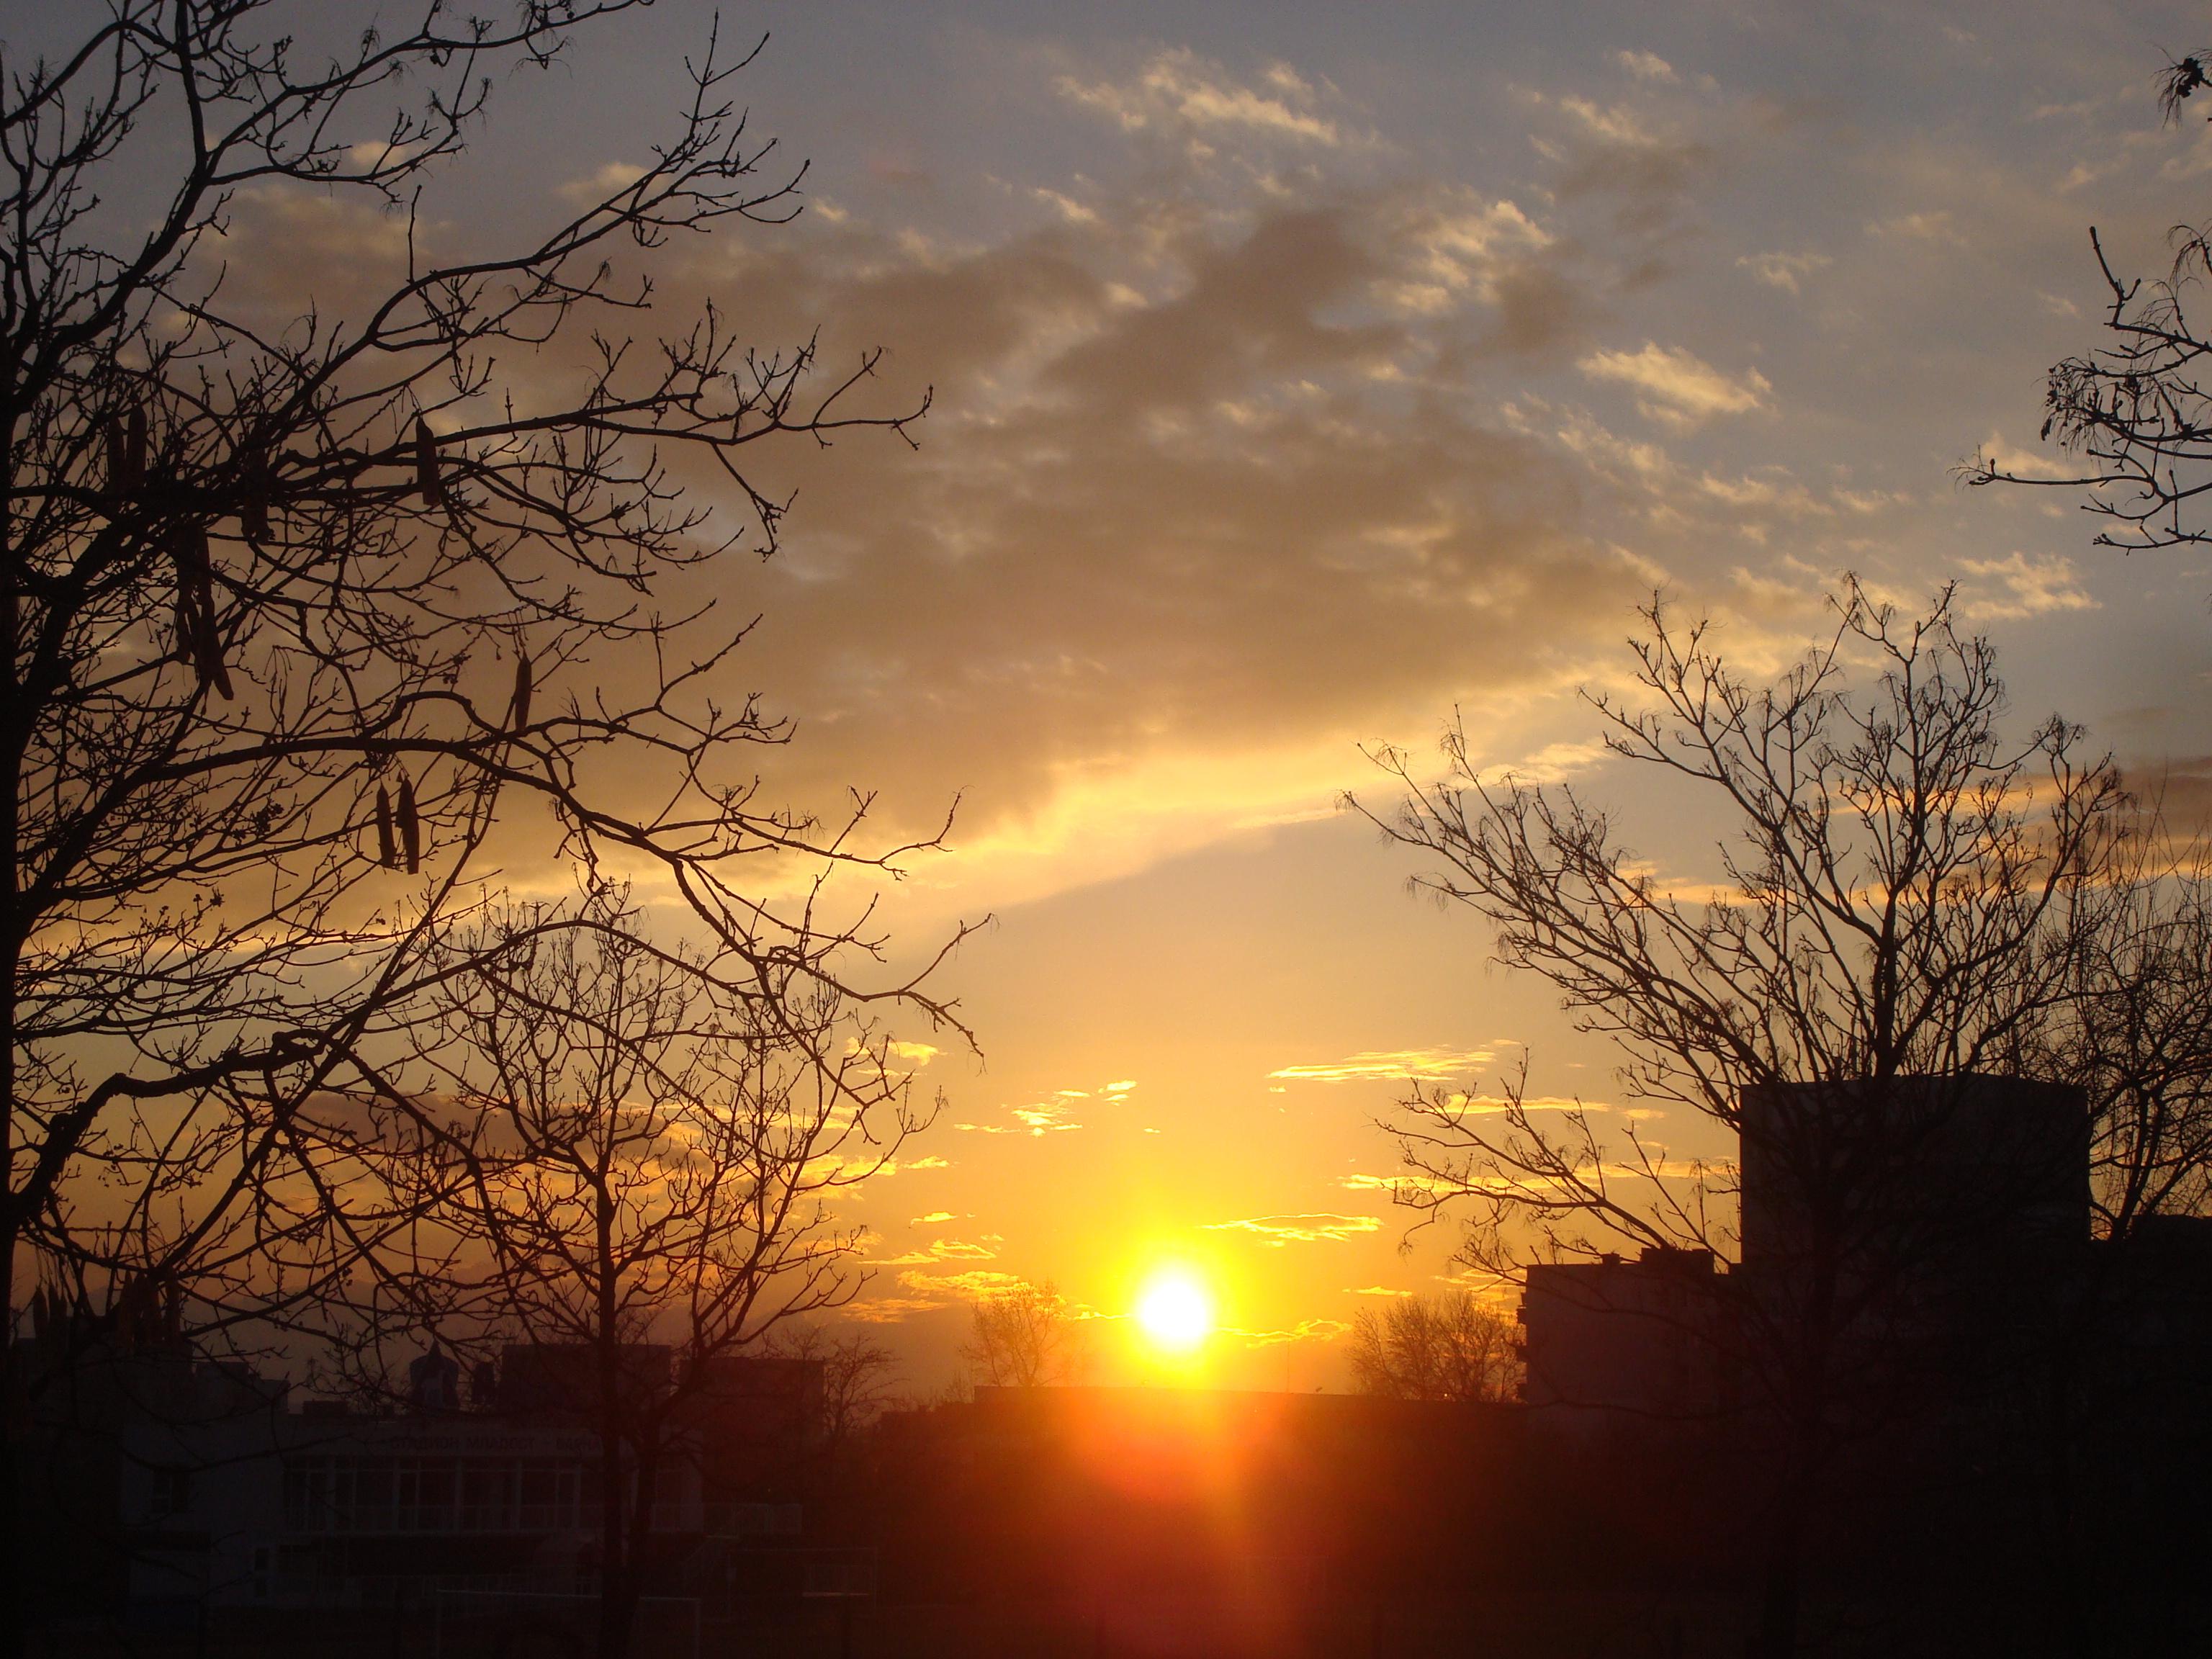 Urban sunset, Beautiful, Clouds, Natural, Nature, HQ Photo